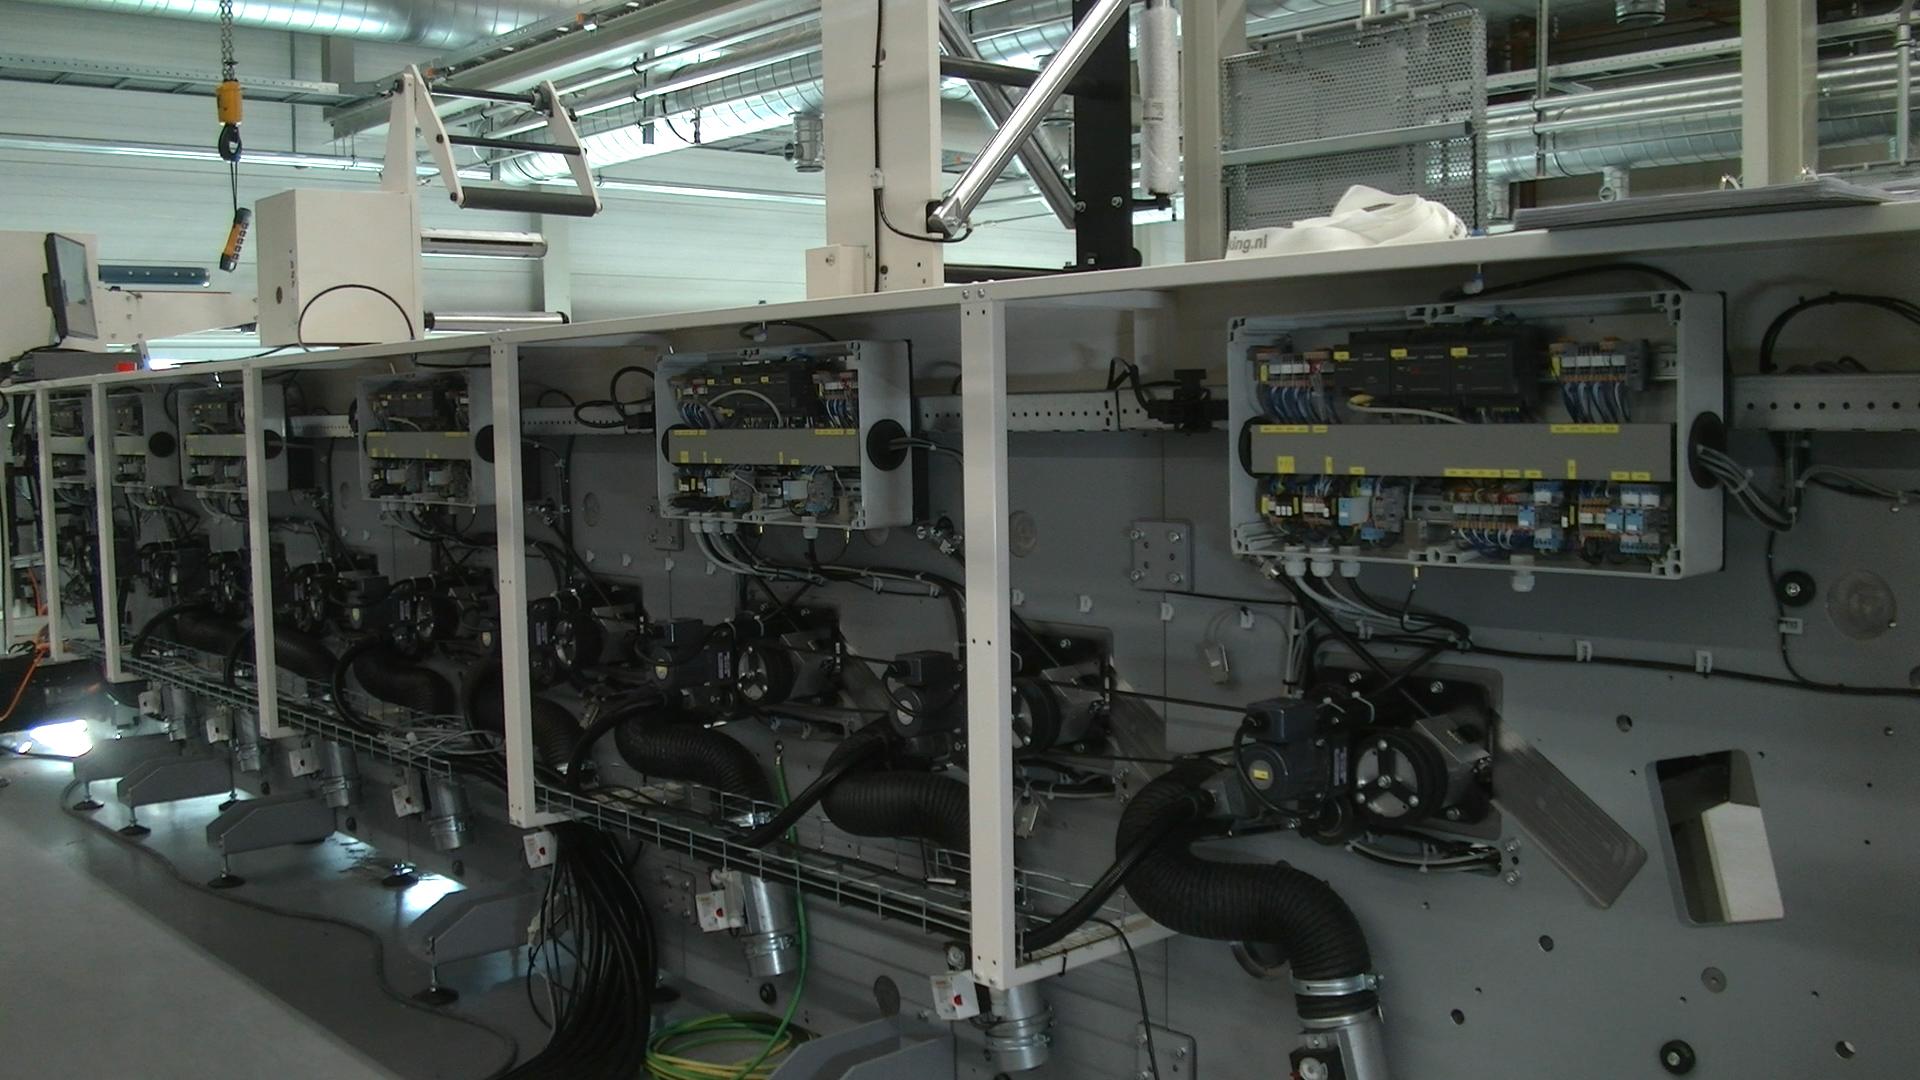 Technisch werk en personeel in oost nederland achterhoek lubron technical services - Industriele apparaten ...